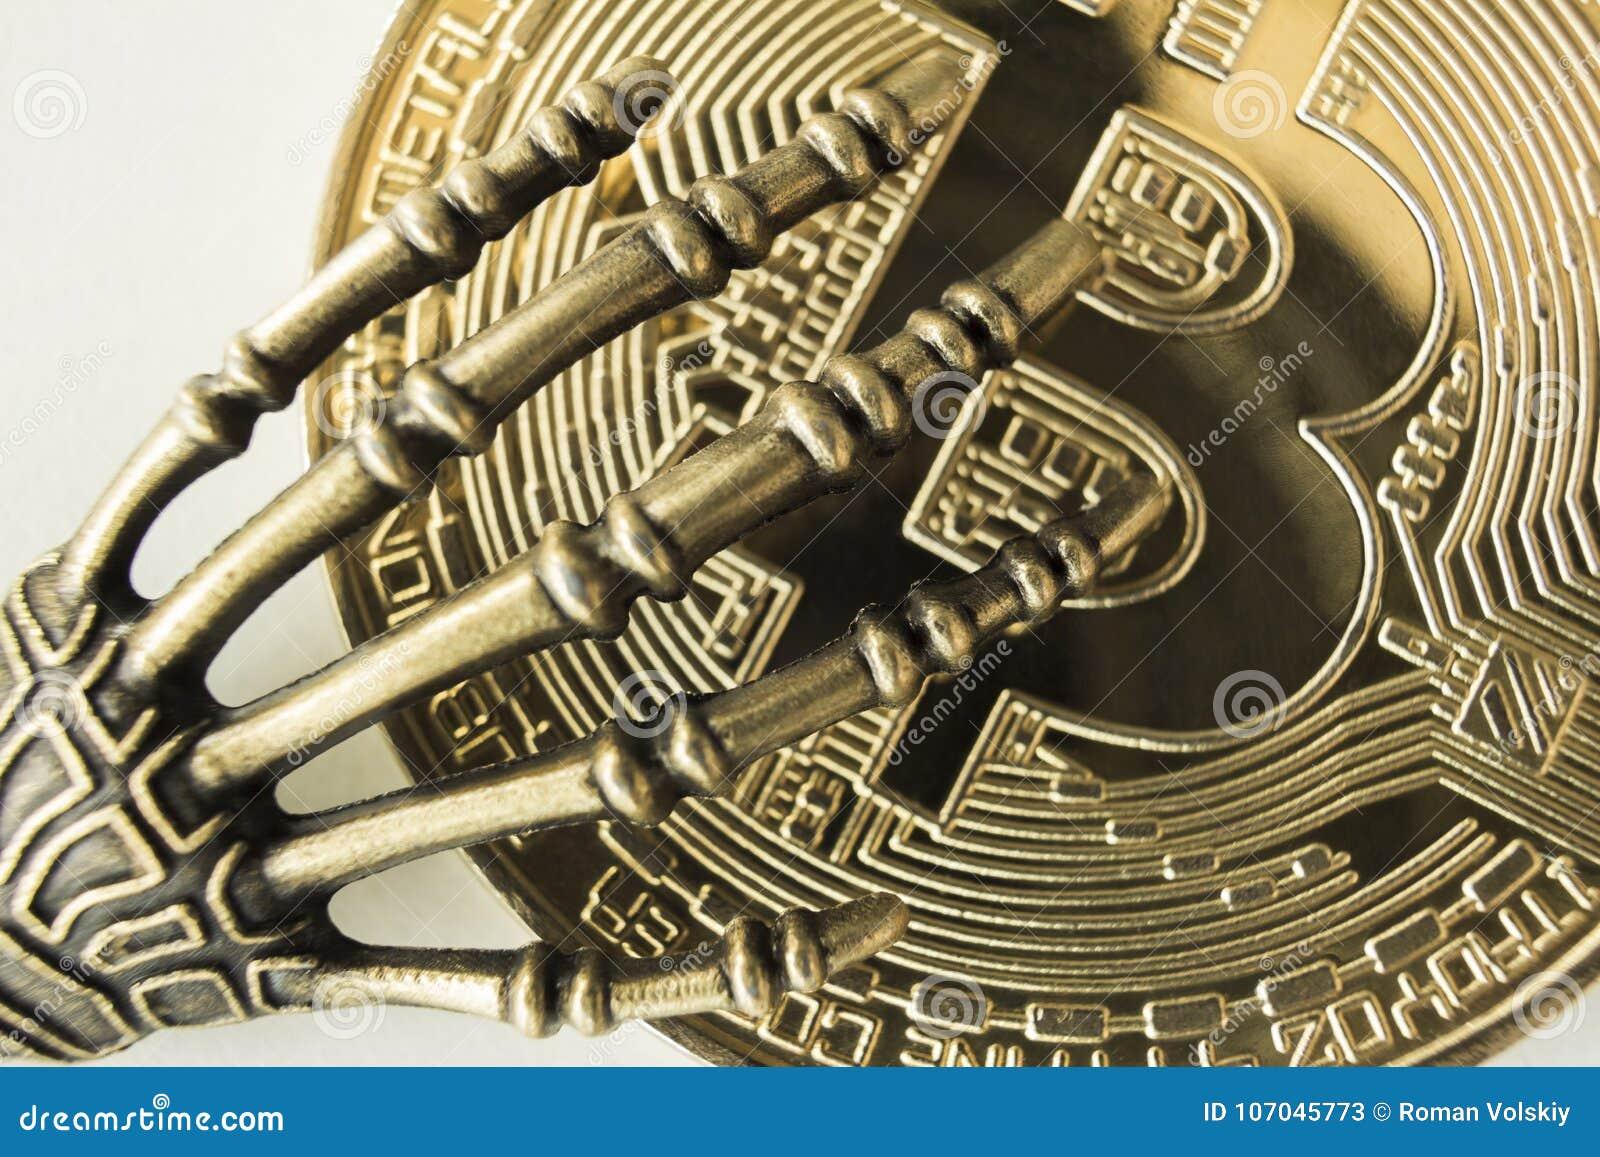 bitcoin monster